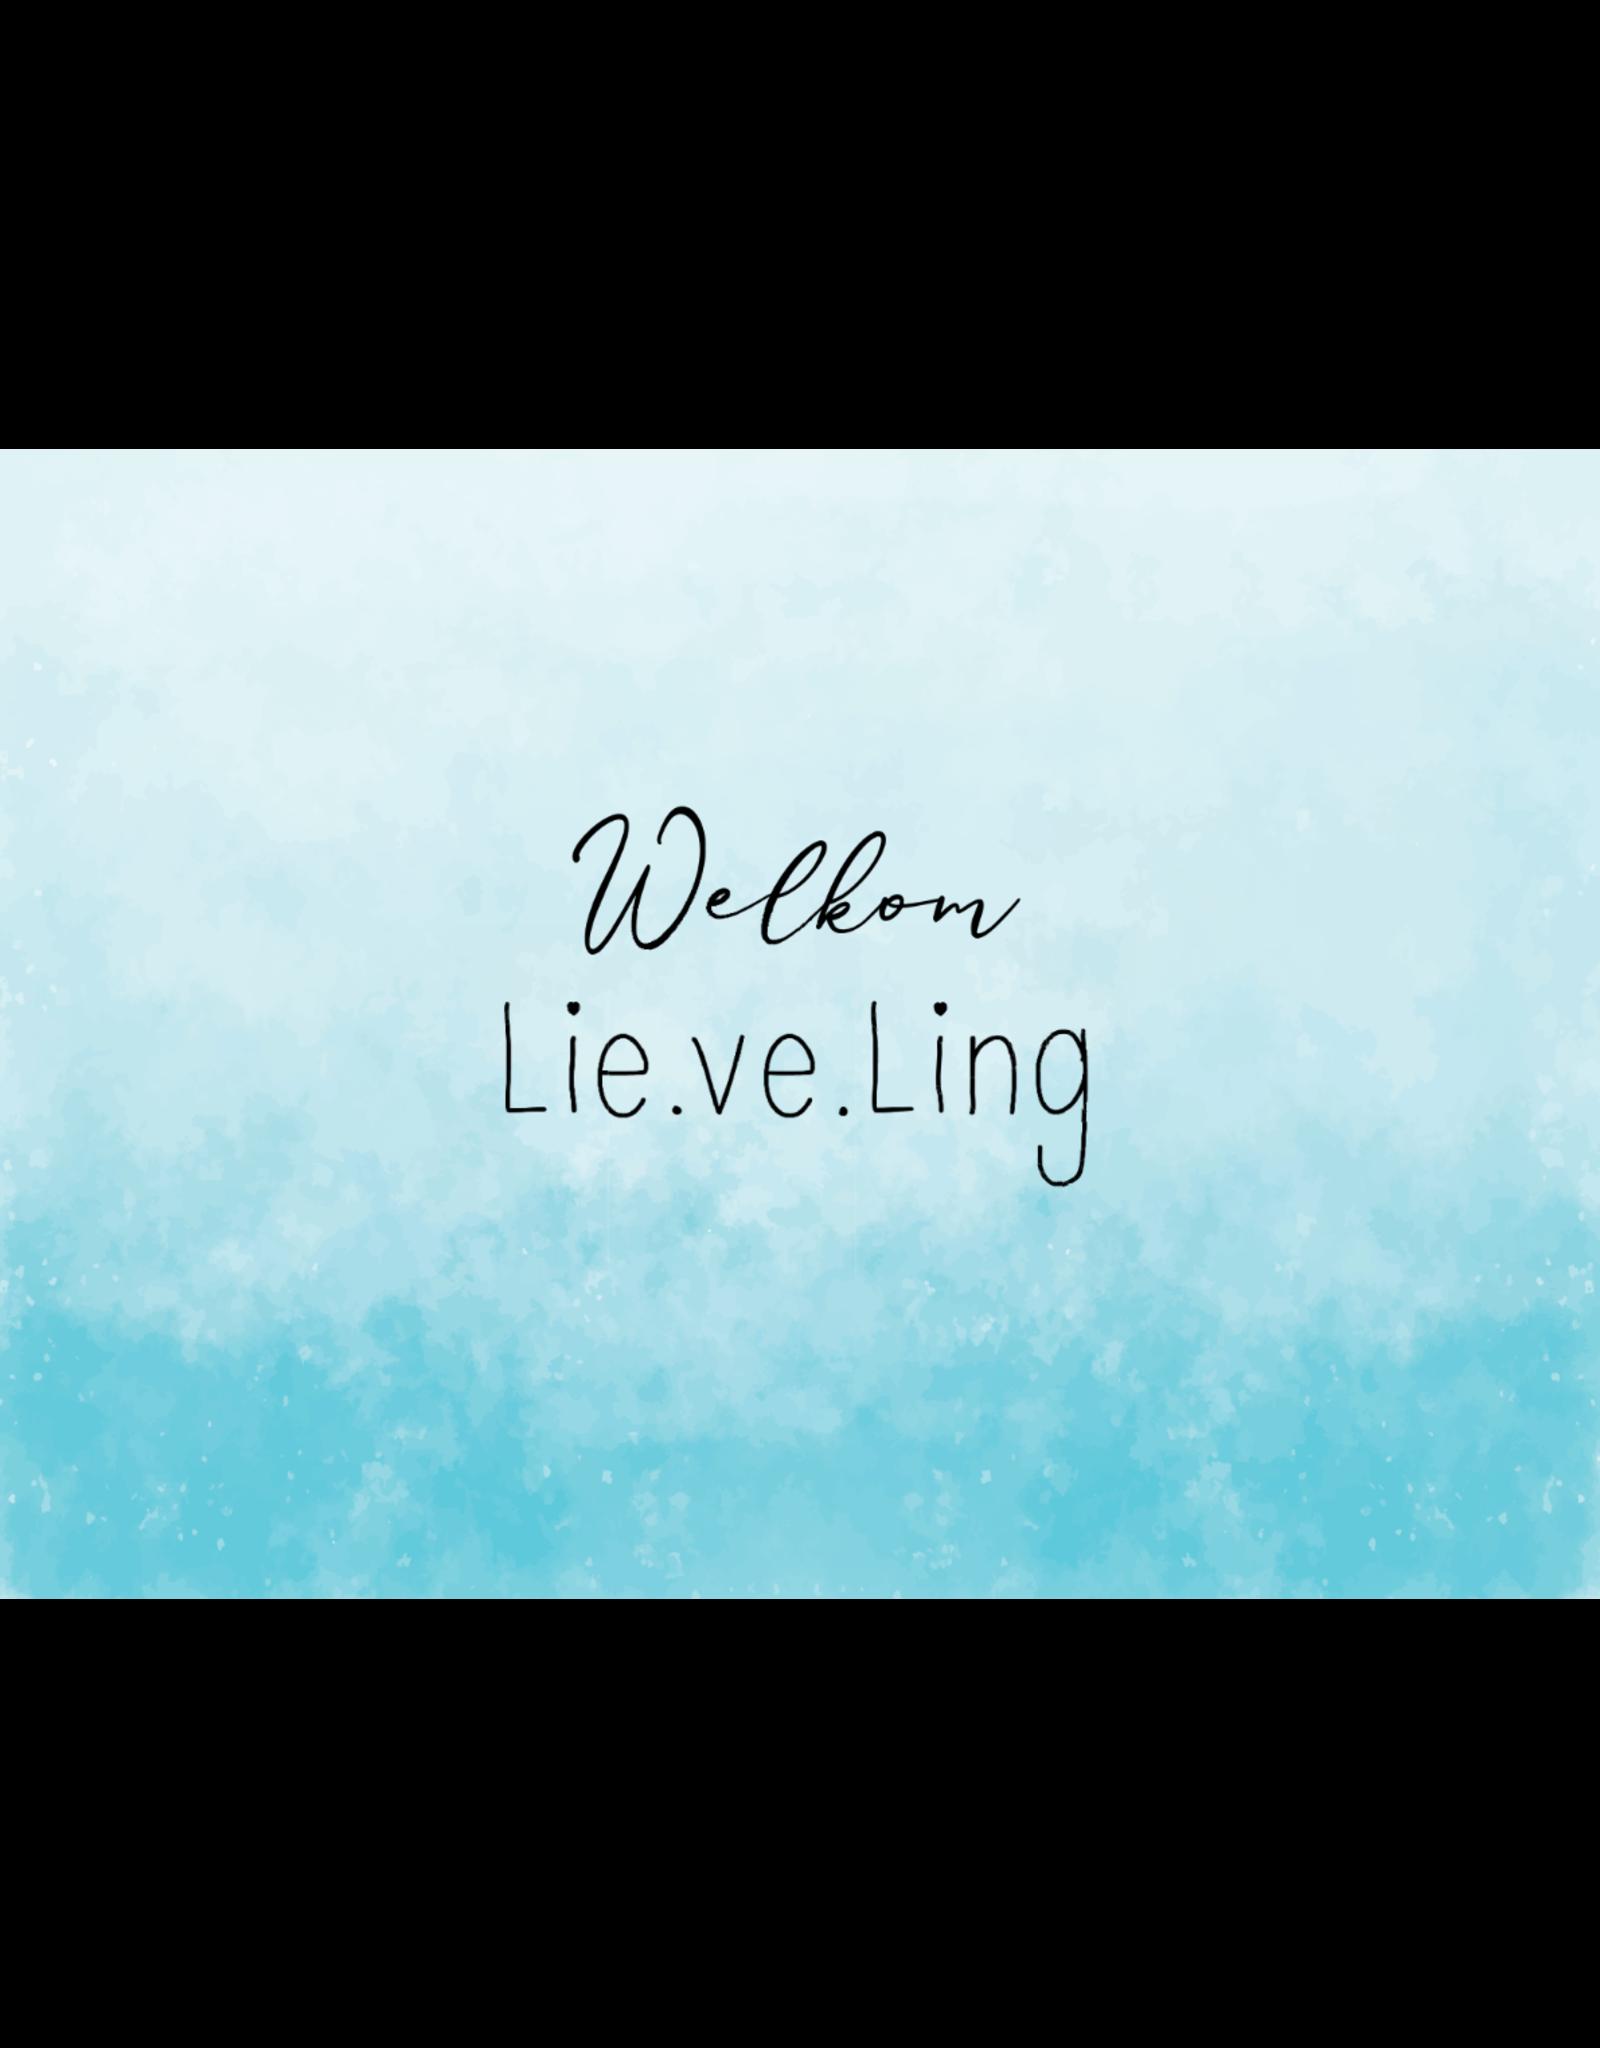 Lie.ve.Ling Kids Kaart Welkom Lieveling blauw